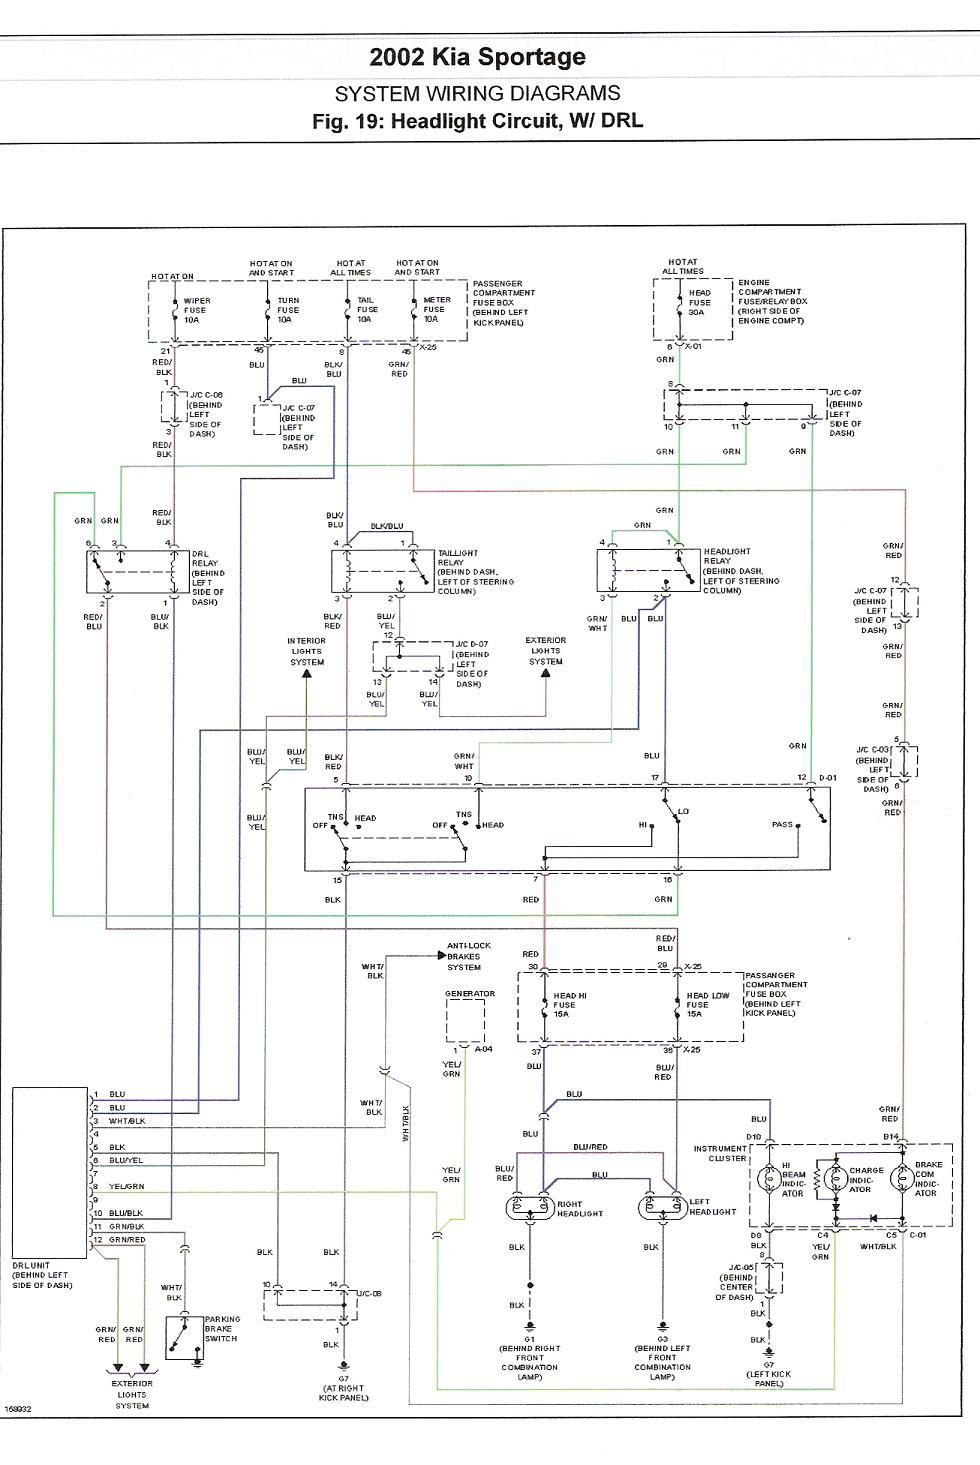 02 Kia Sportage Running Lights Fuse Diagram